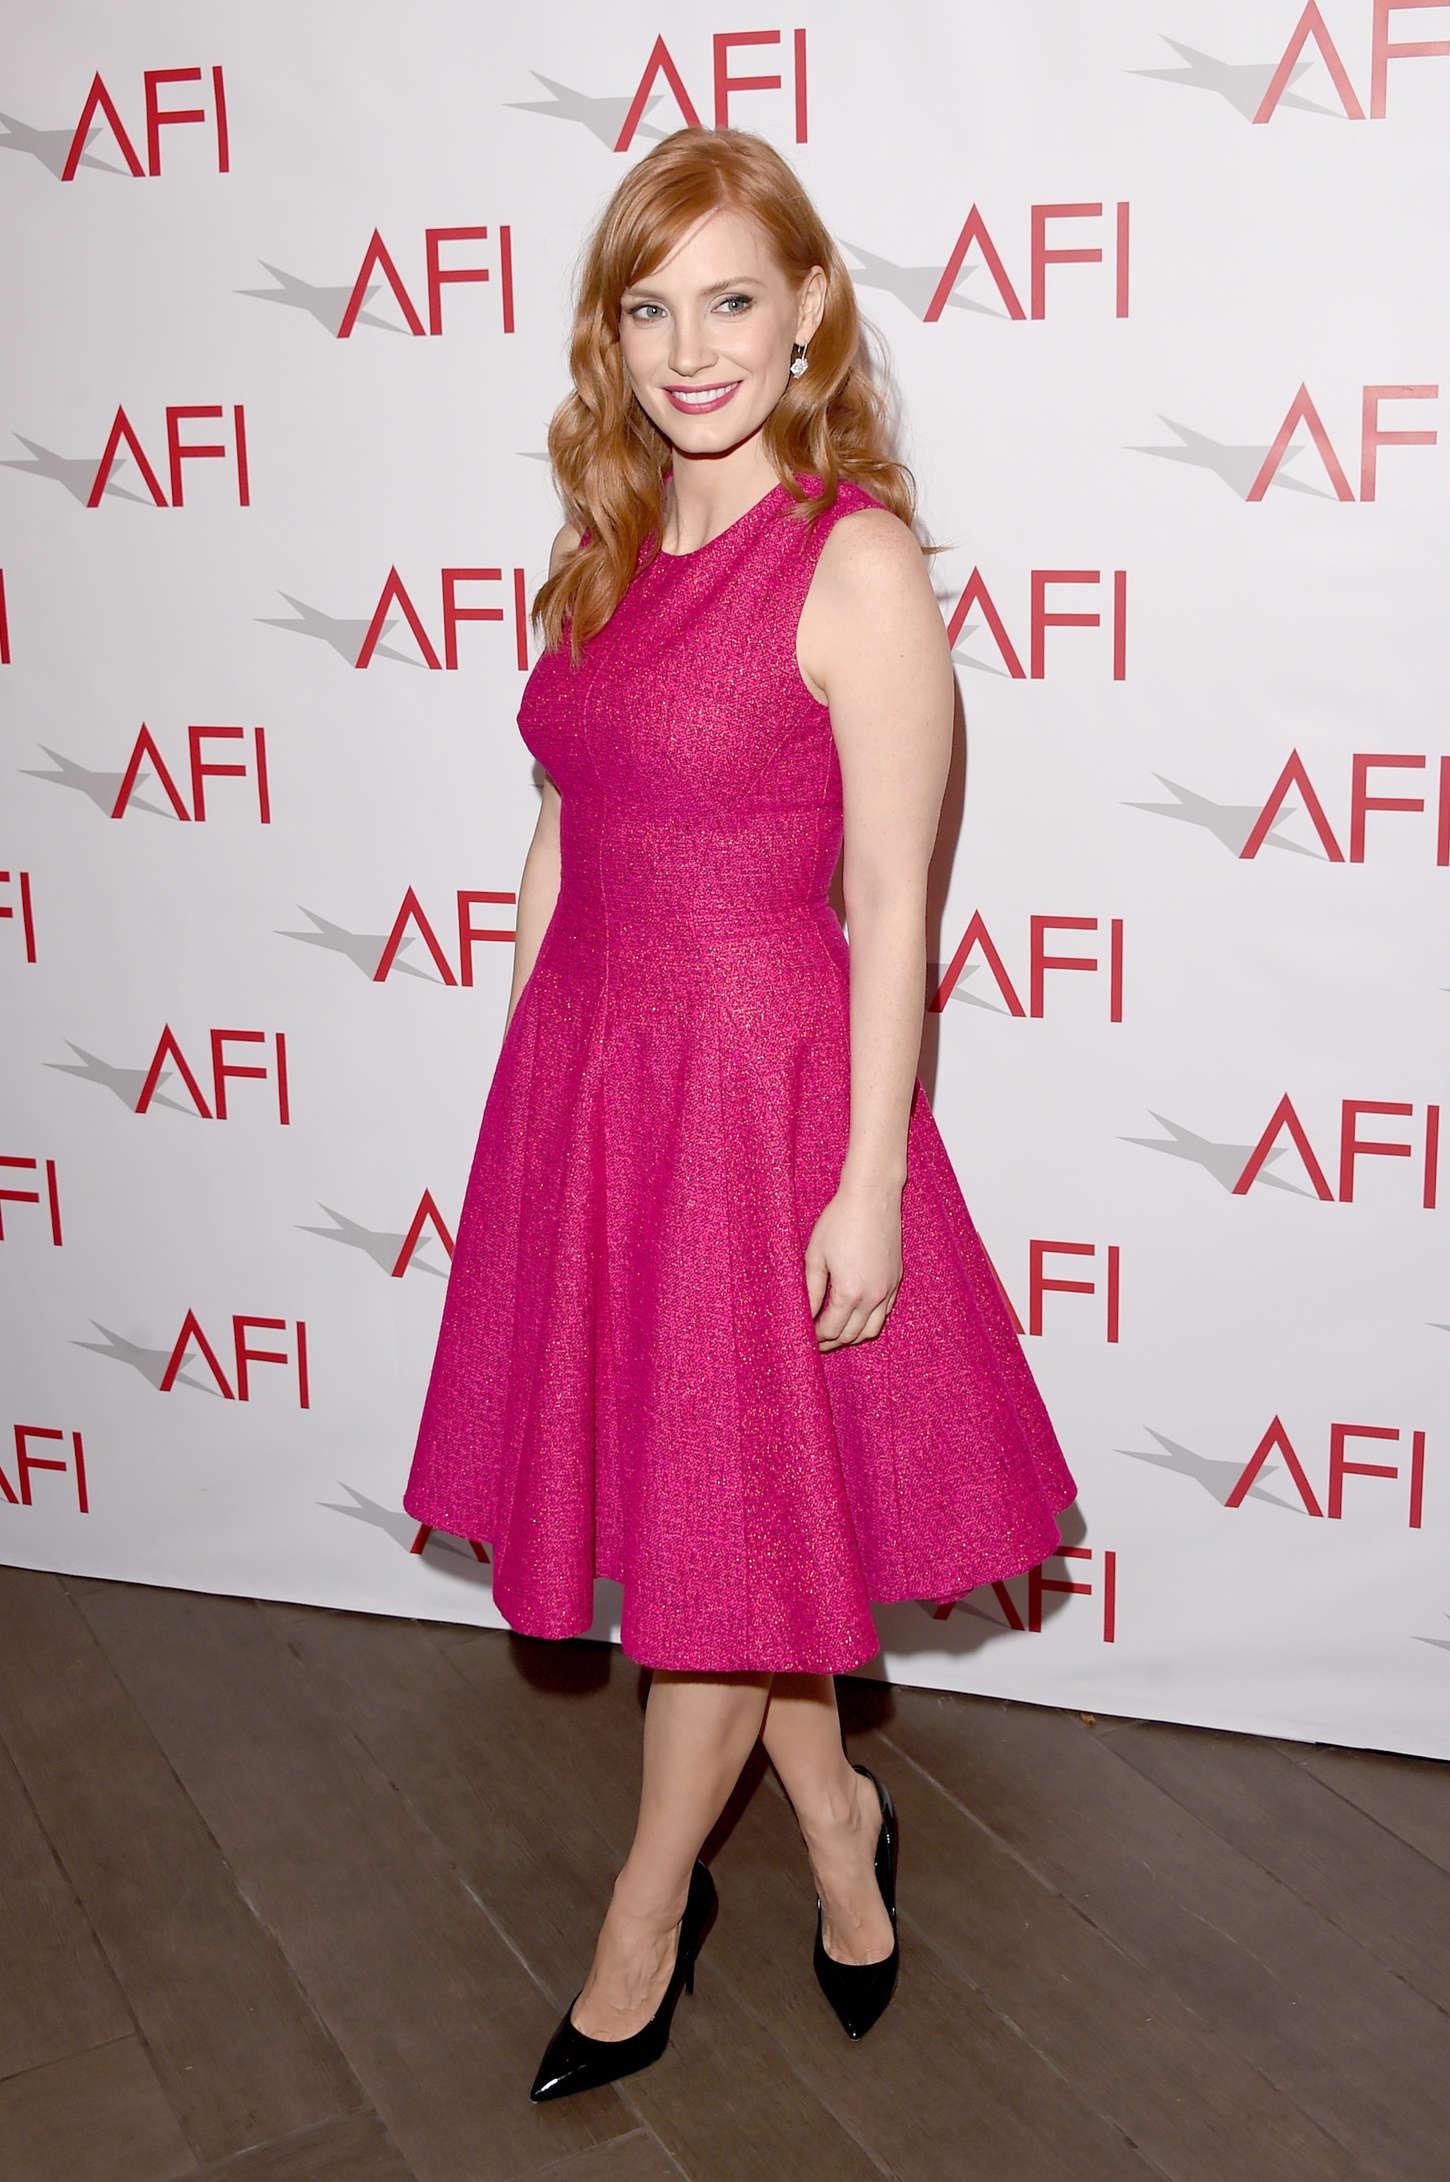 Jessica Chastain 2015 : Jessica Chastain: 2015 AFI Awards -05